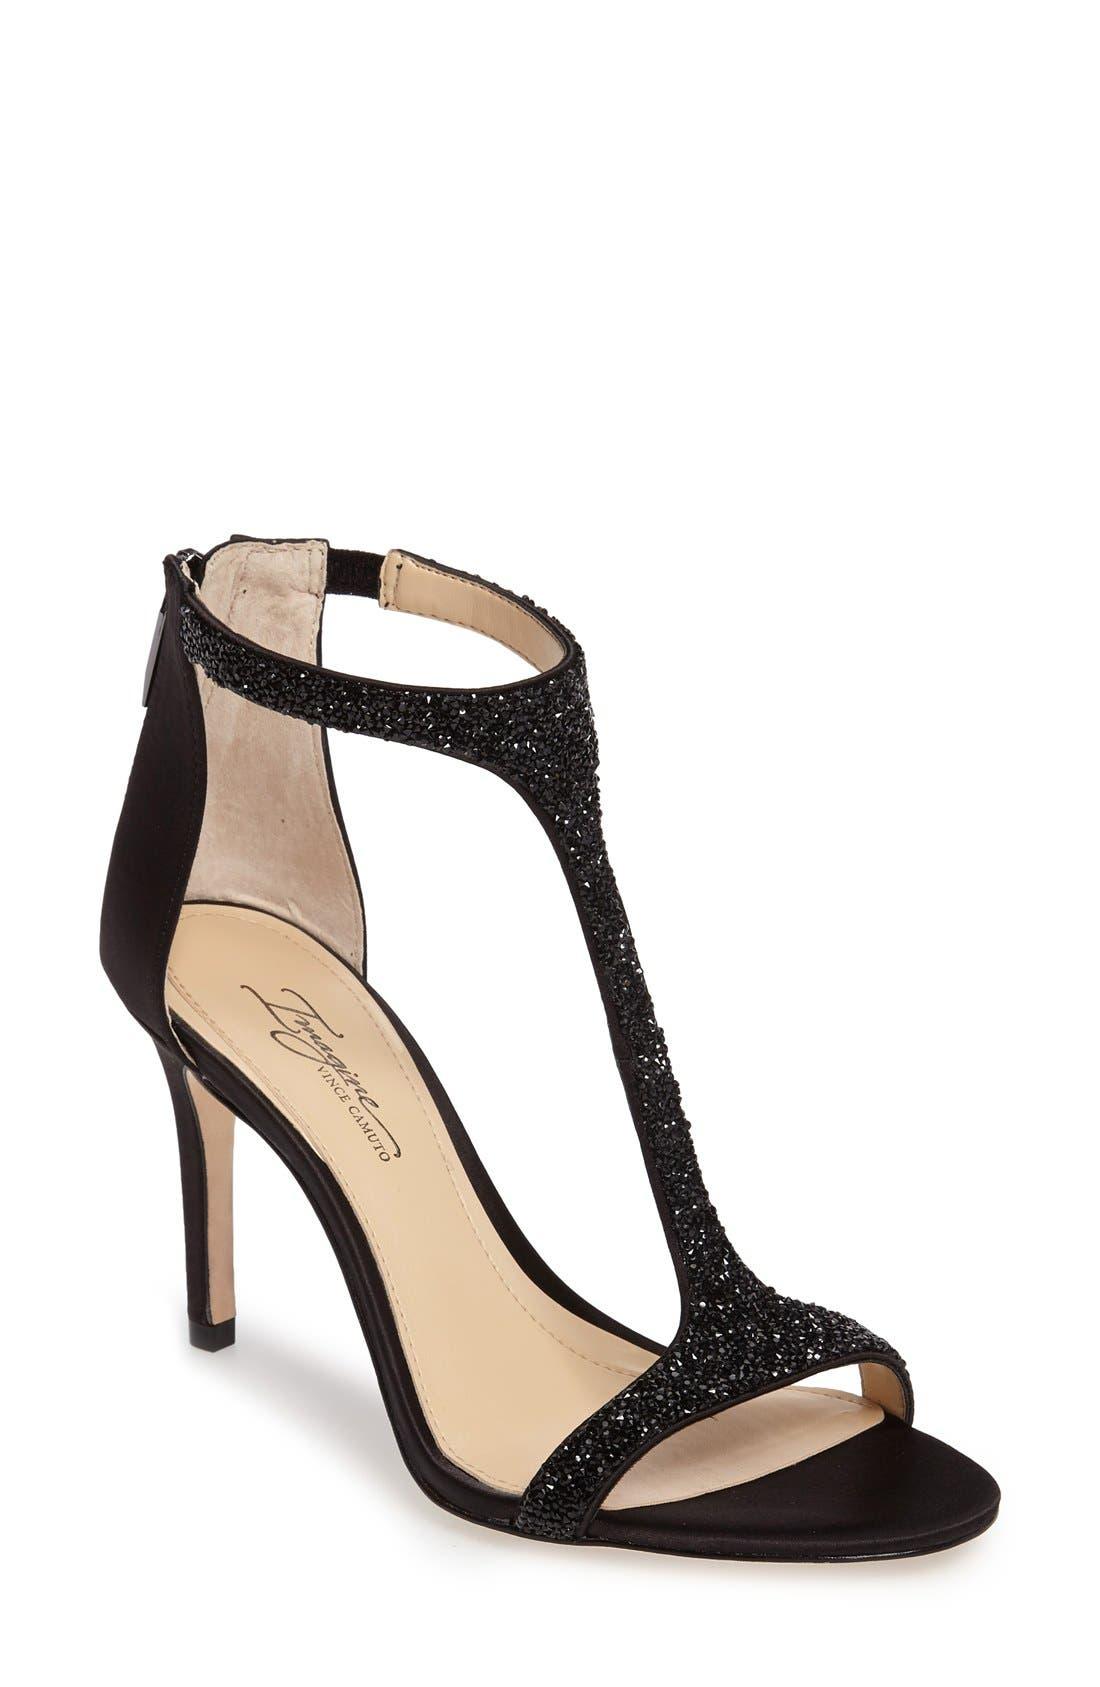 'Phoebe' Embellished T-Strap Sandal,                             Main thumbnail 5, color,